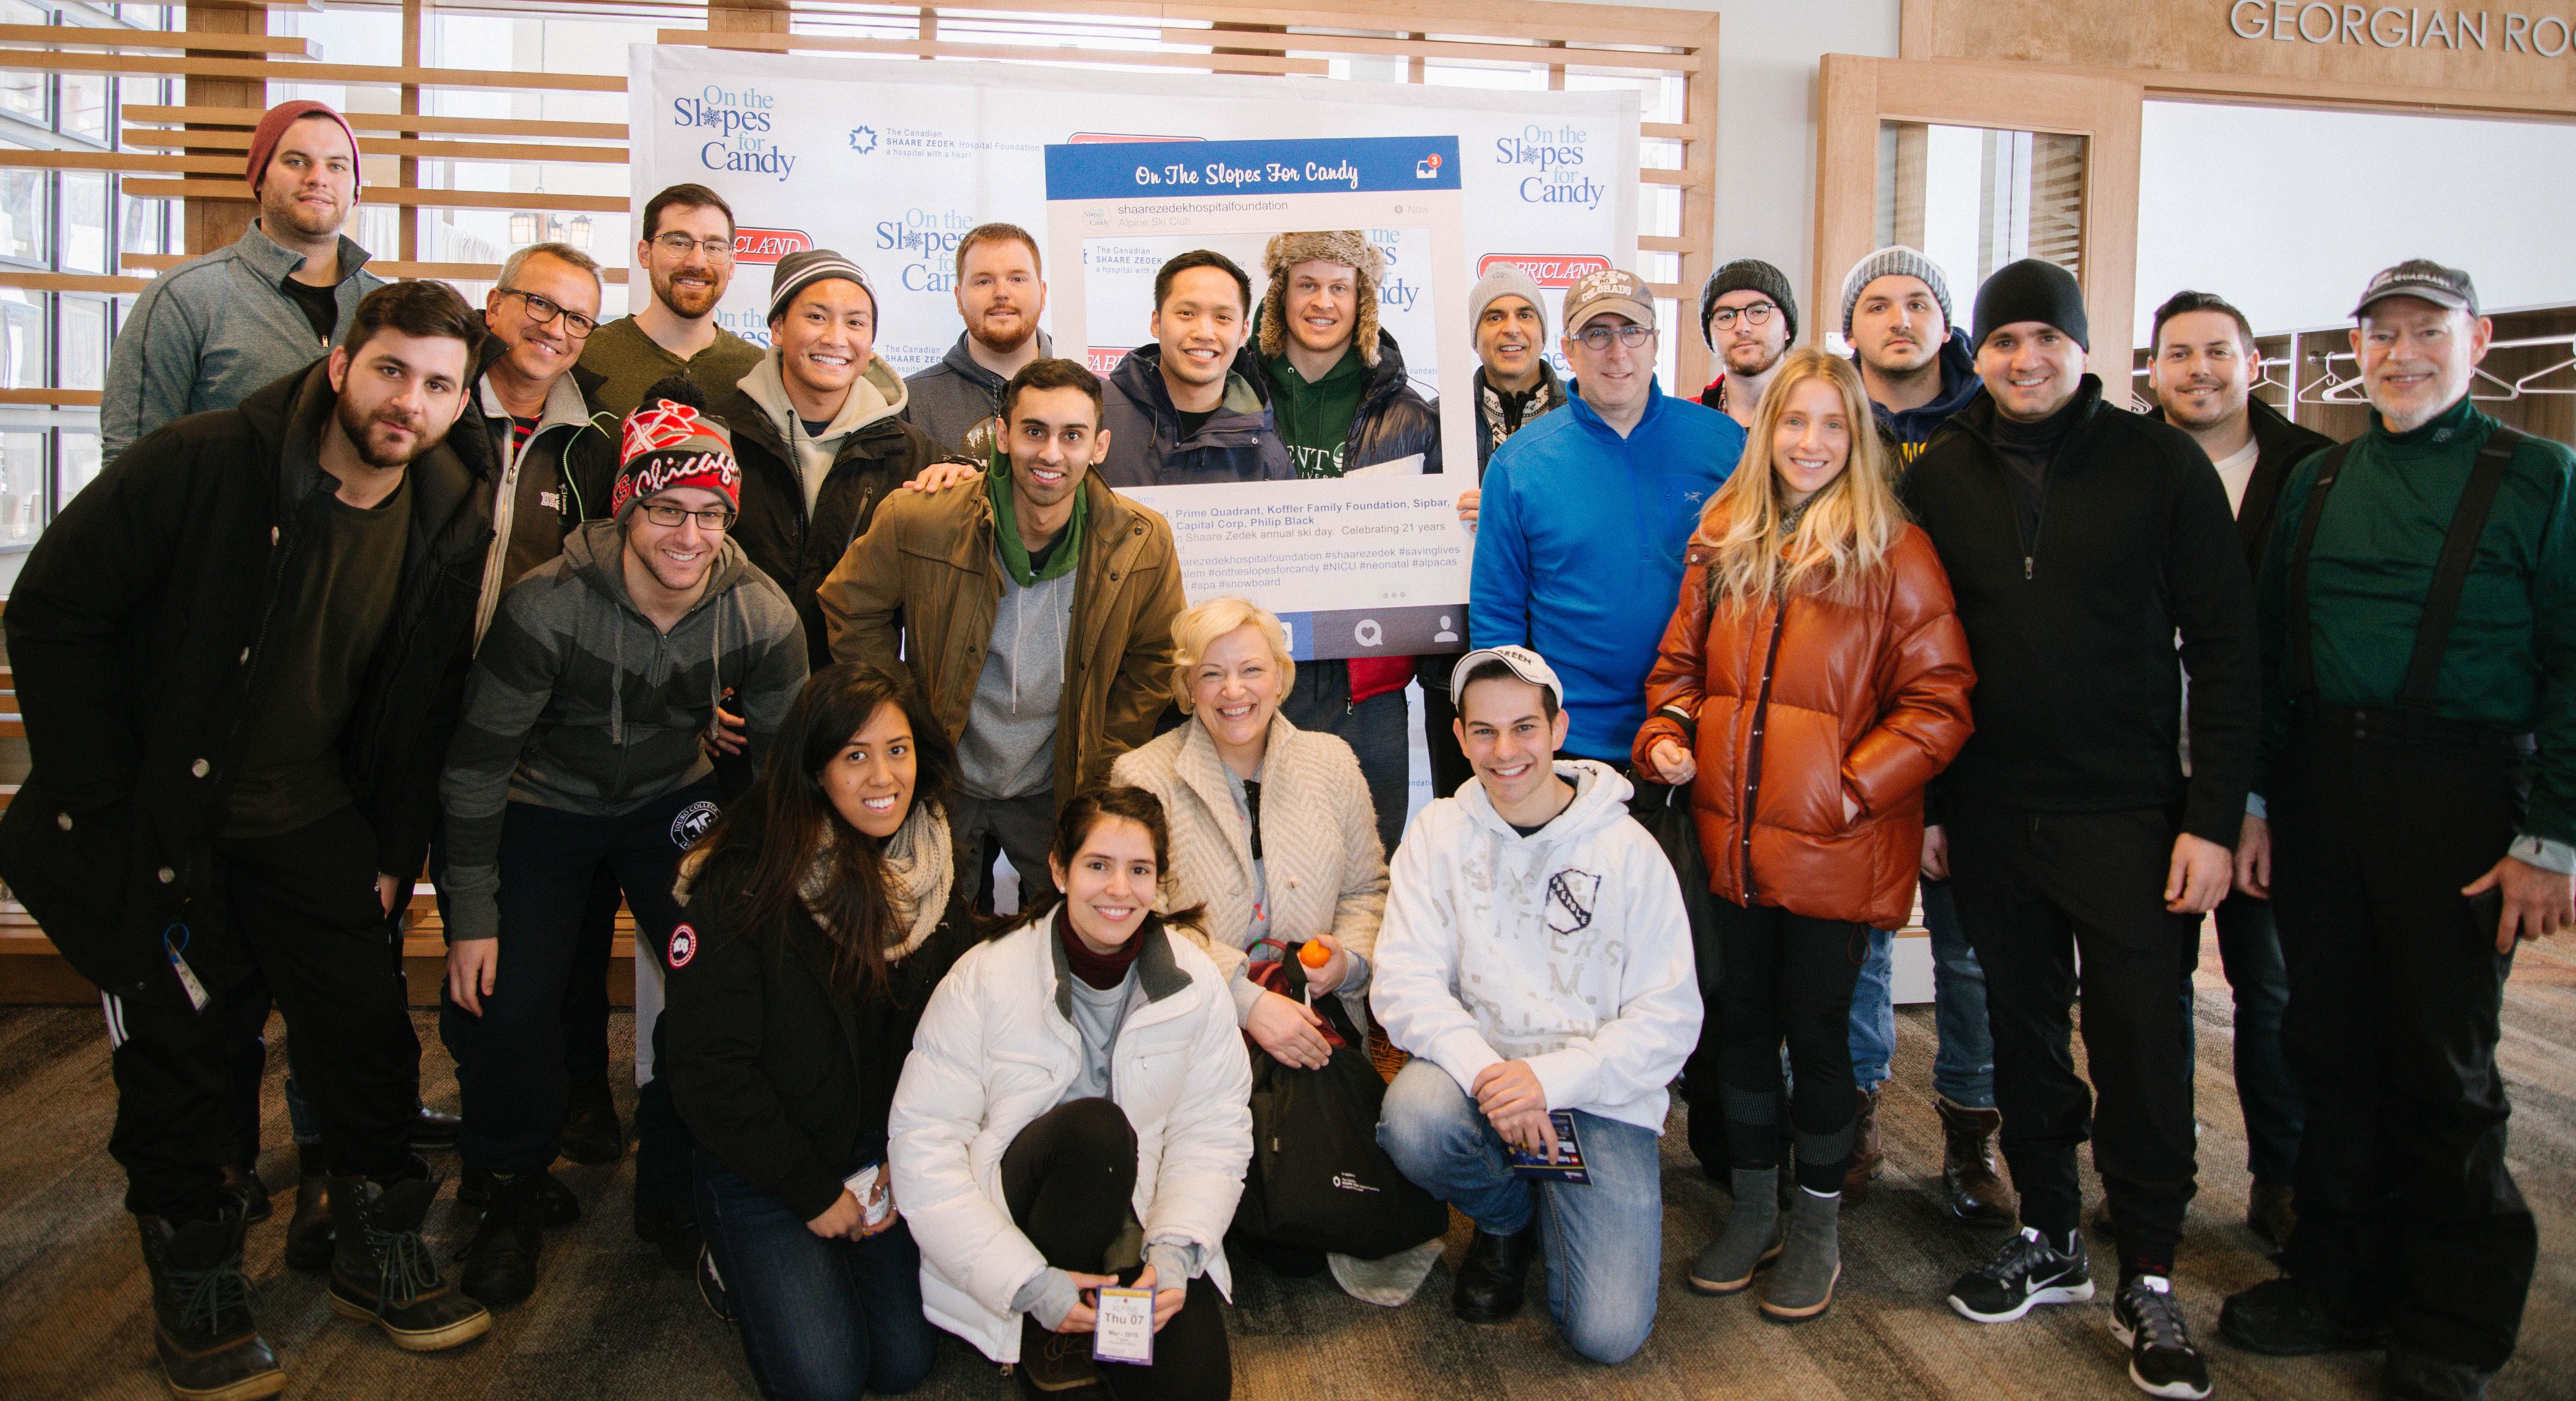 Prime Quadrant team members posing at a ski resort for the Shaare Zedek Hospital Foundation